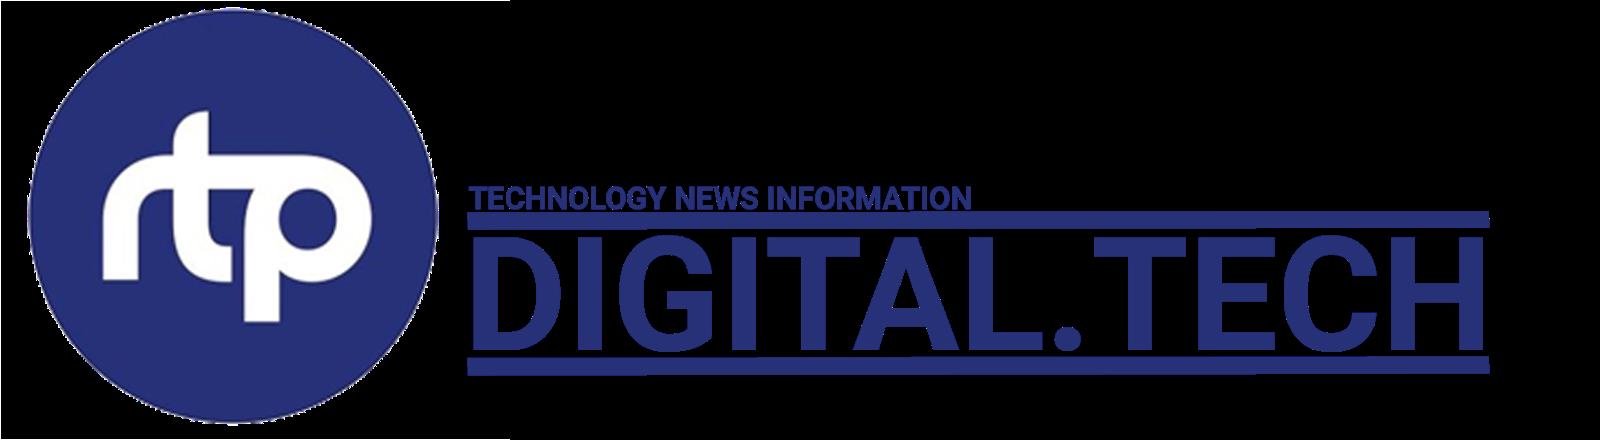 Rtp.Digital